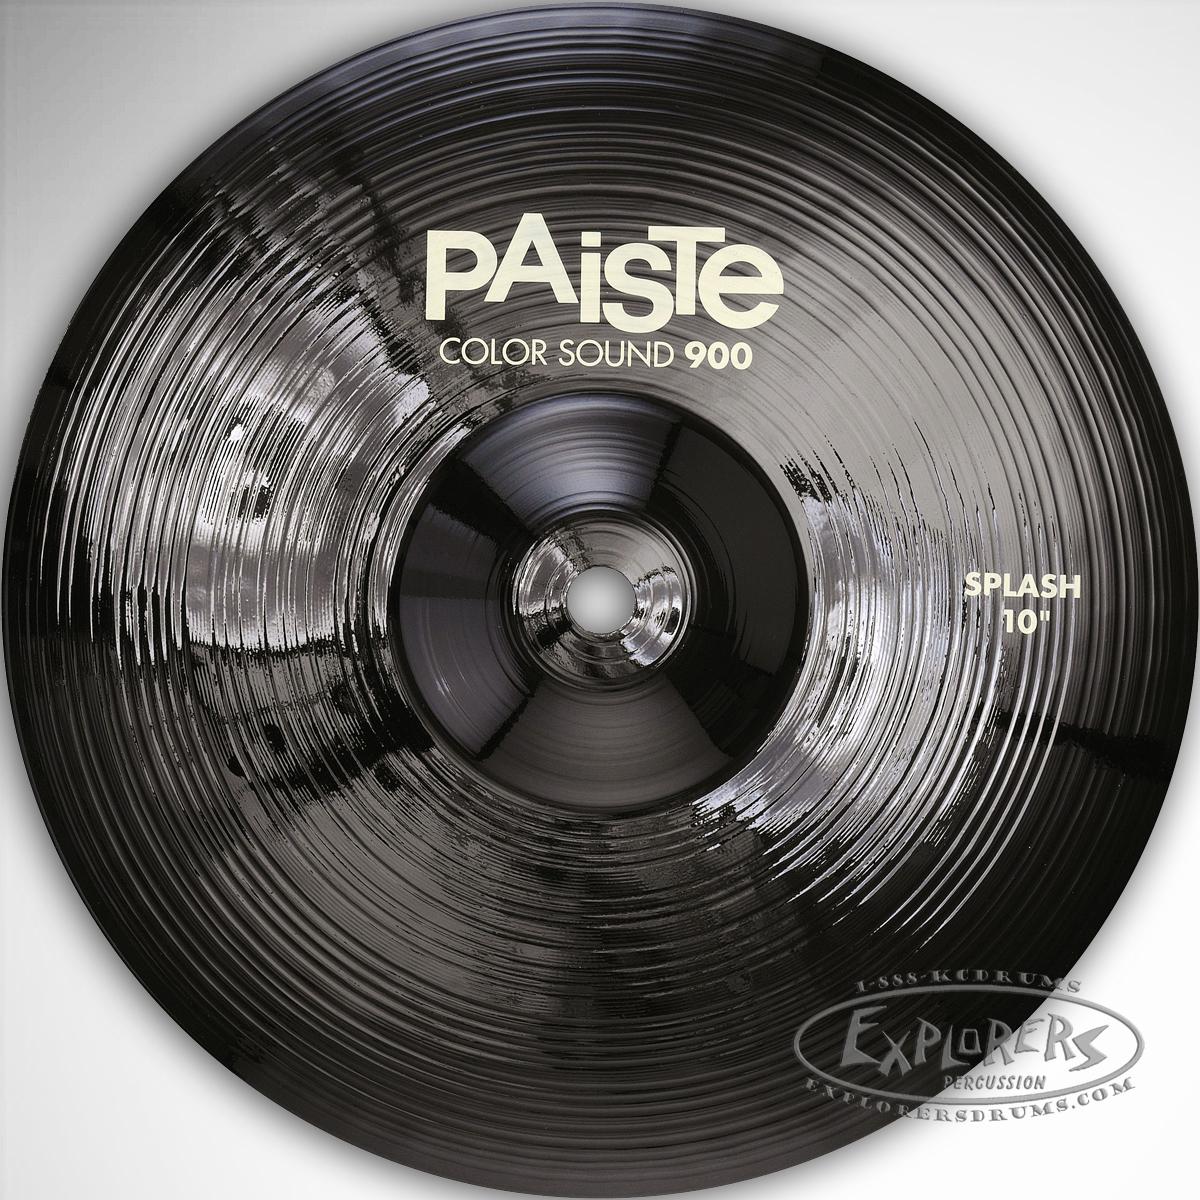 paiste 900 series color sound 10 splash cymbal black. Black Bedroom Furniture Sets. Home Design Ideas